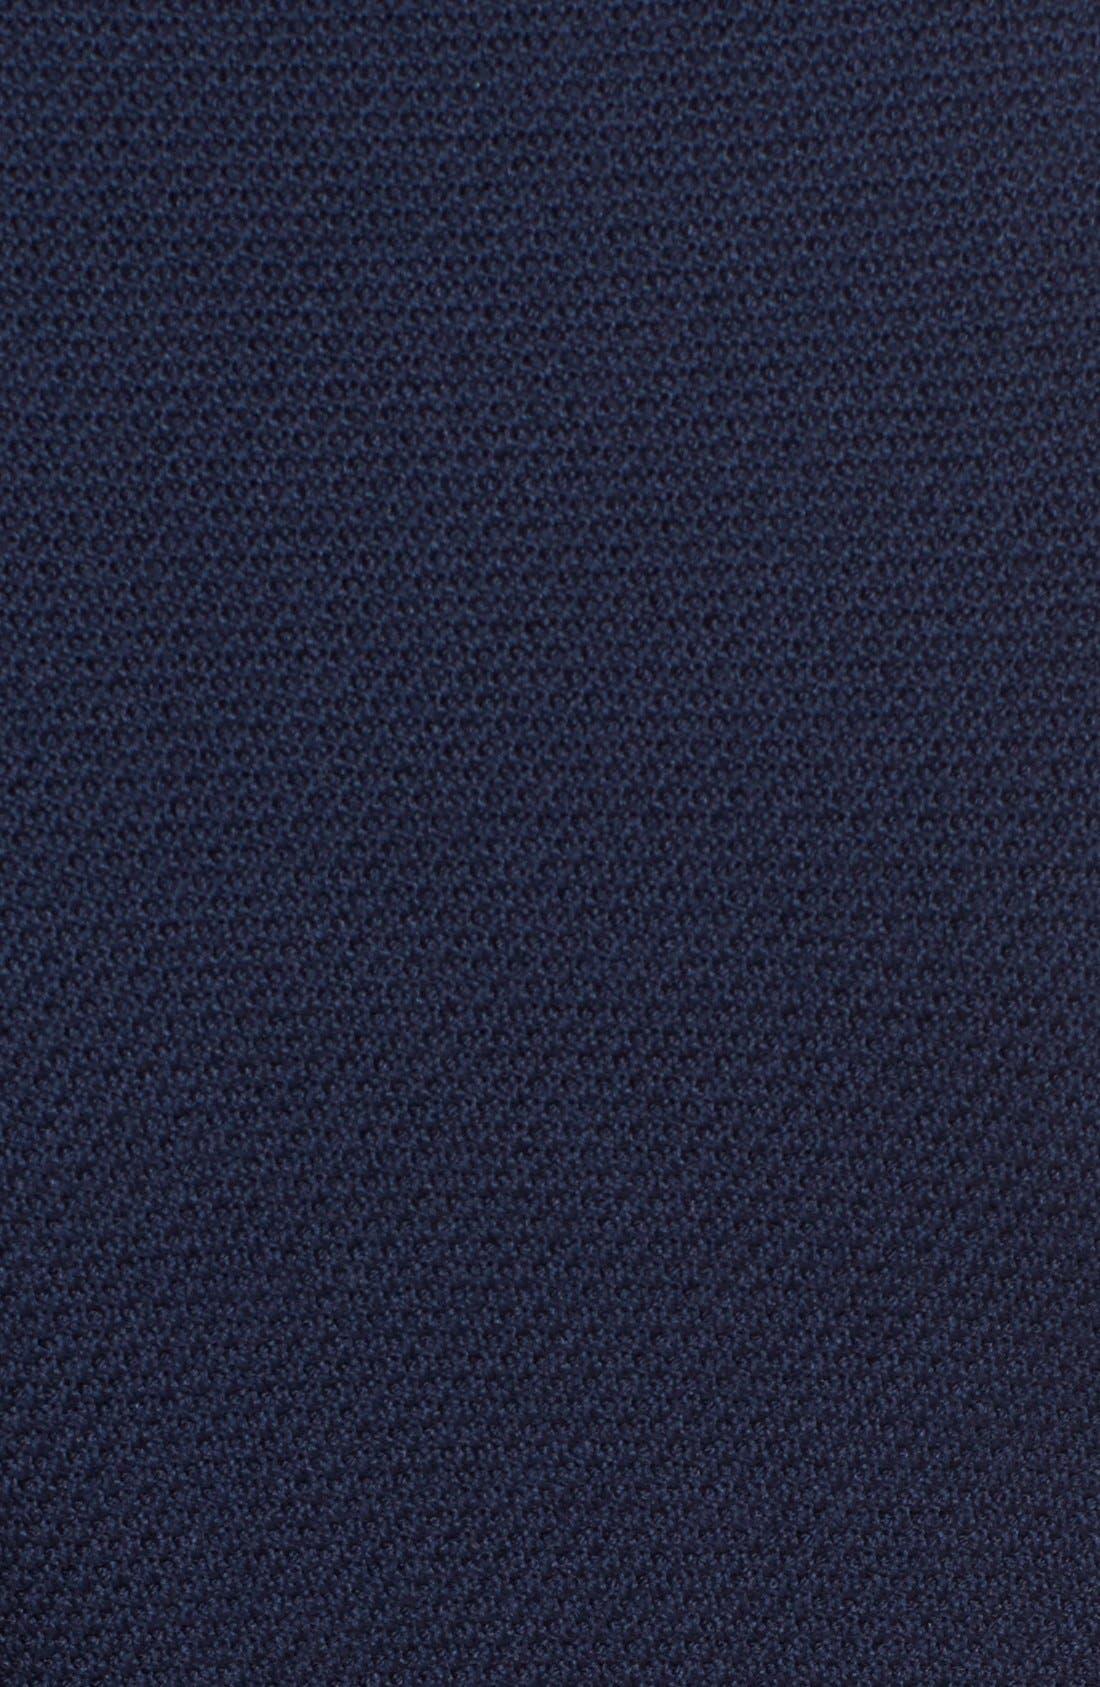 ST. JOHN COLLECTION, Micro Bouclé Knit Jacket, Alternate thumbnail 5, color, NAVY